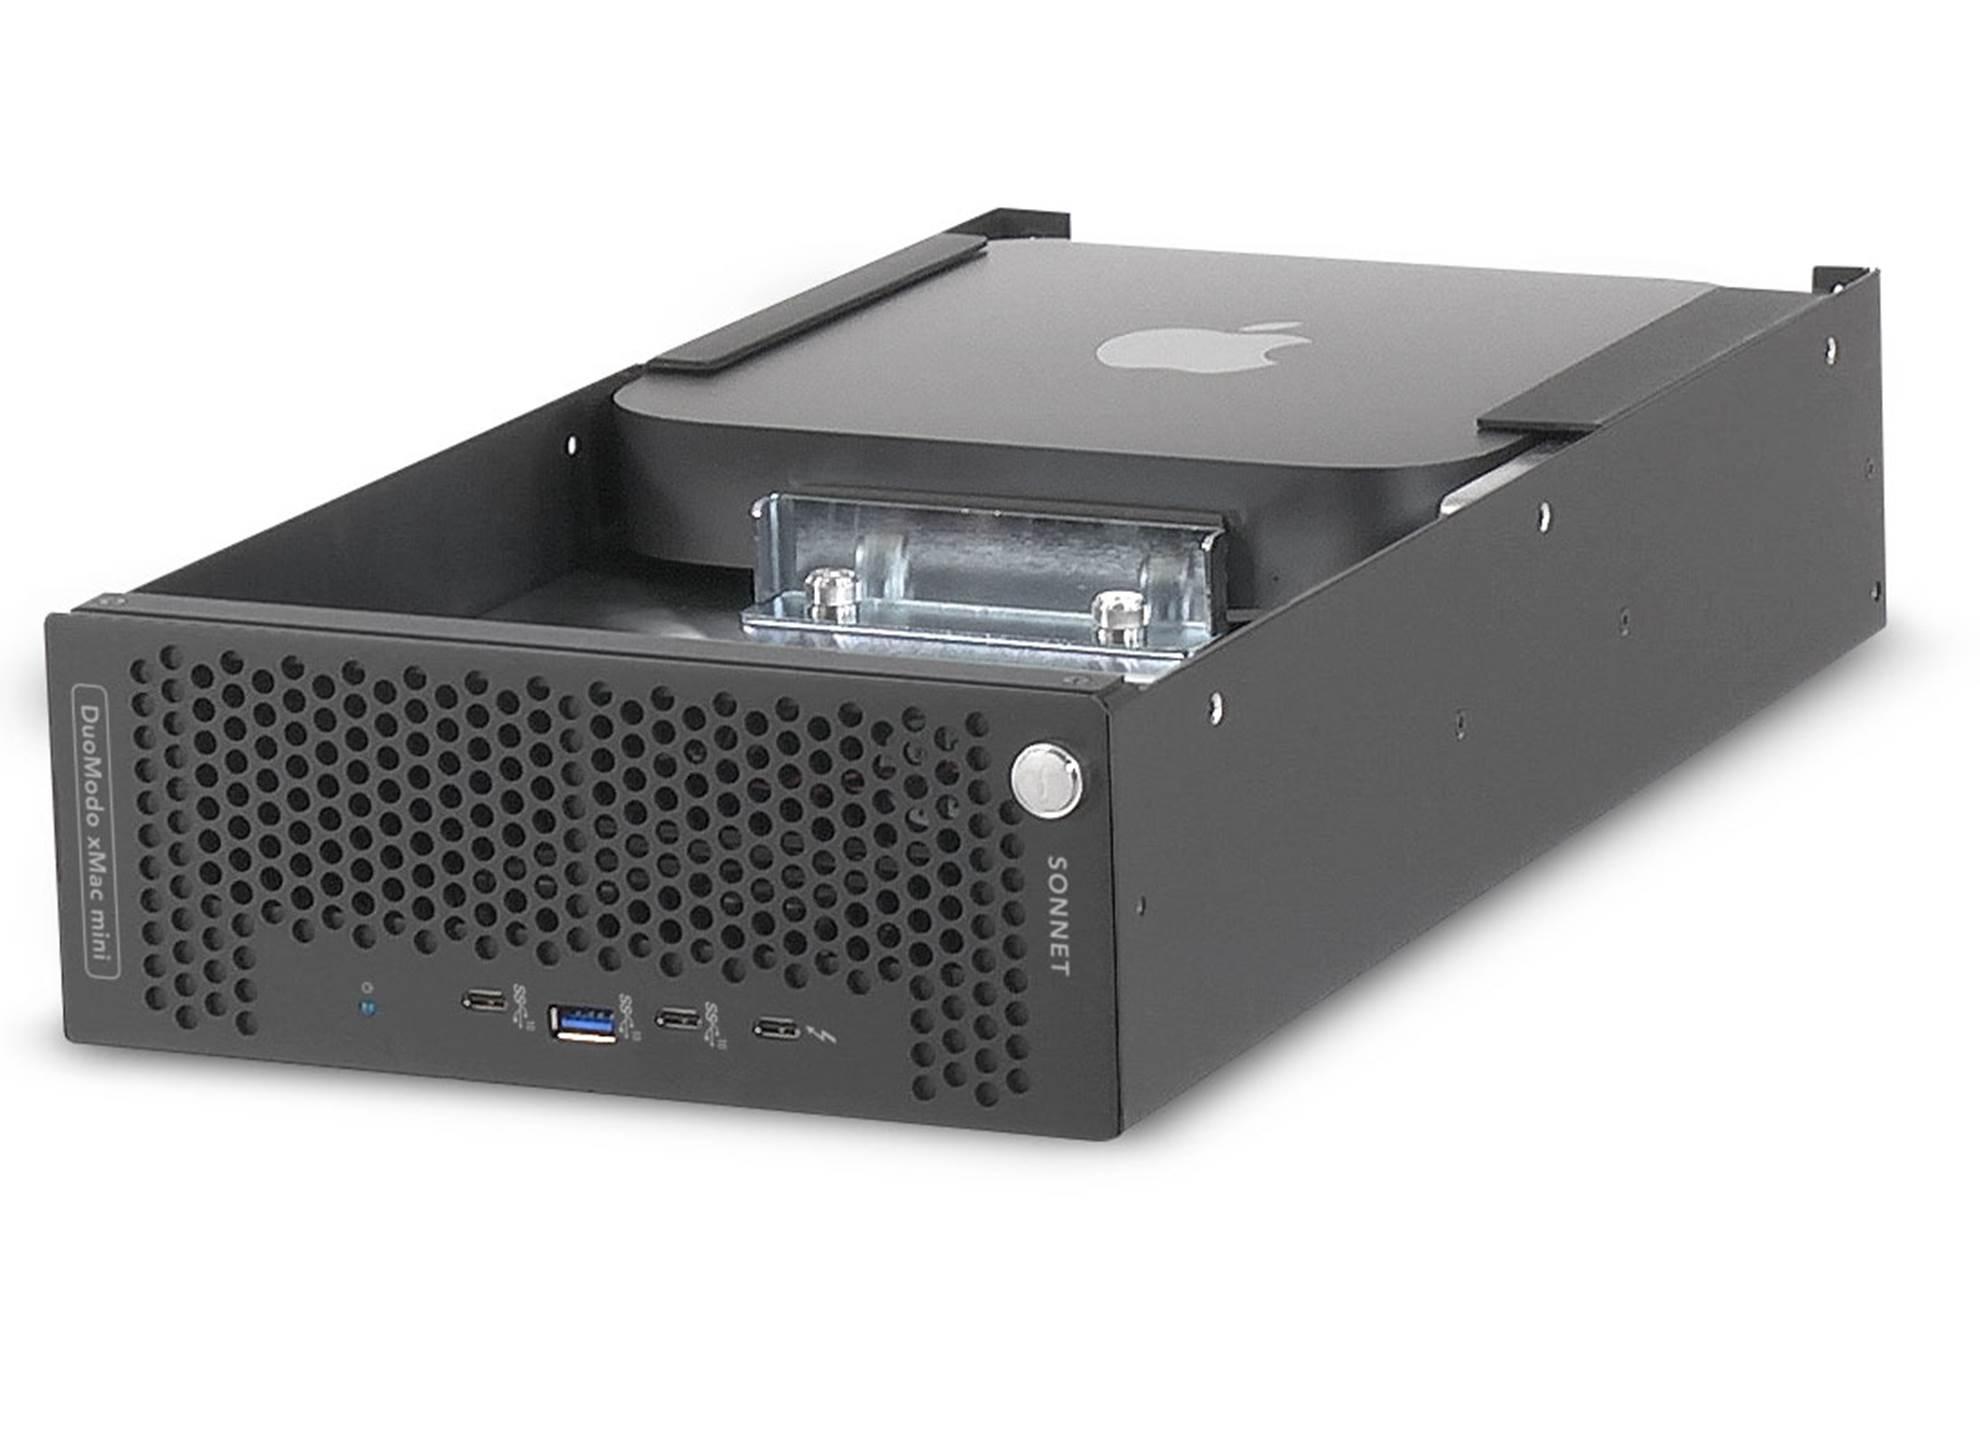 DuoModo xMac mini/eGPU Rack